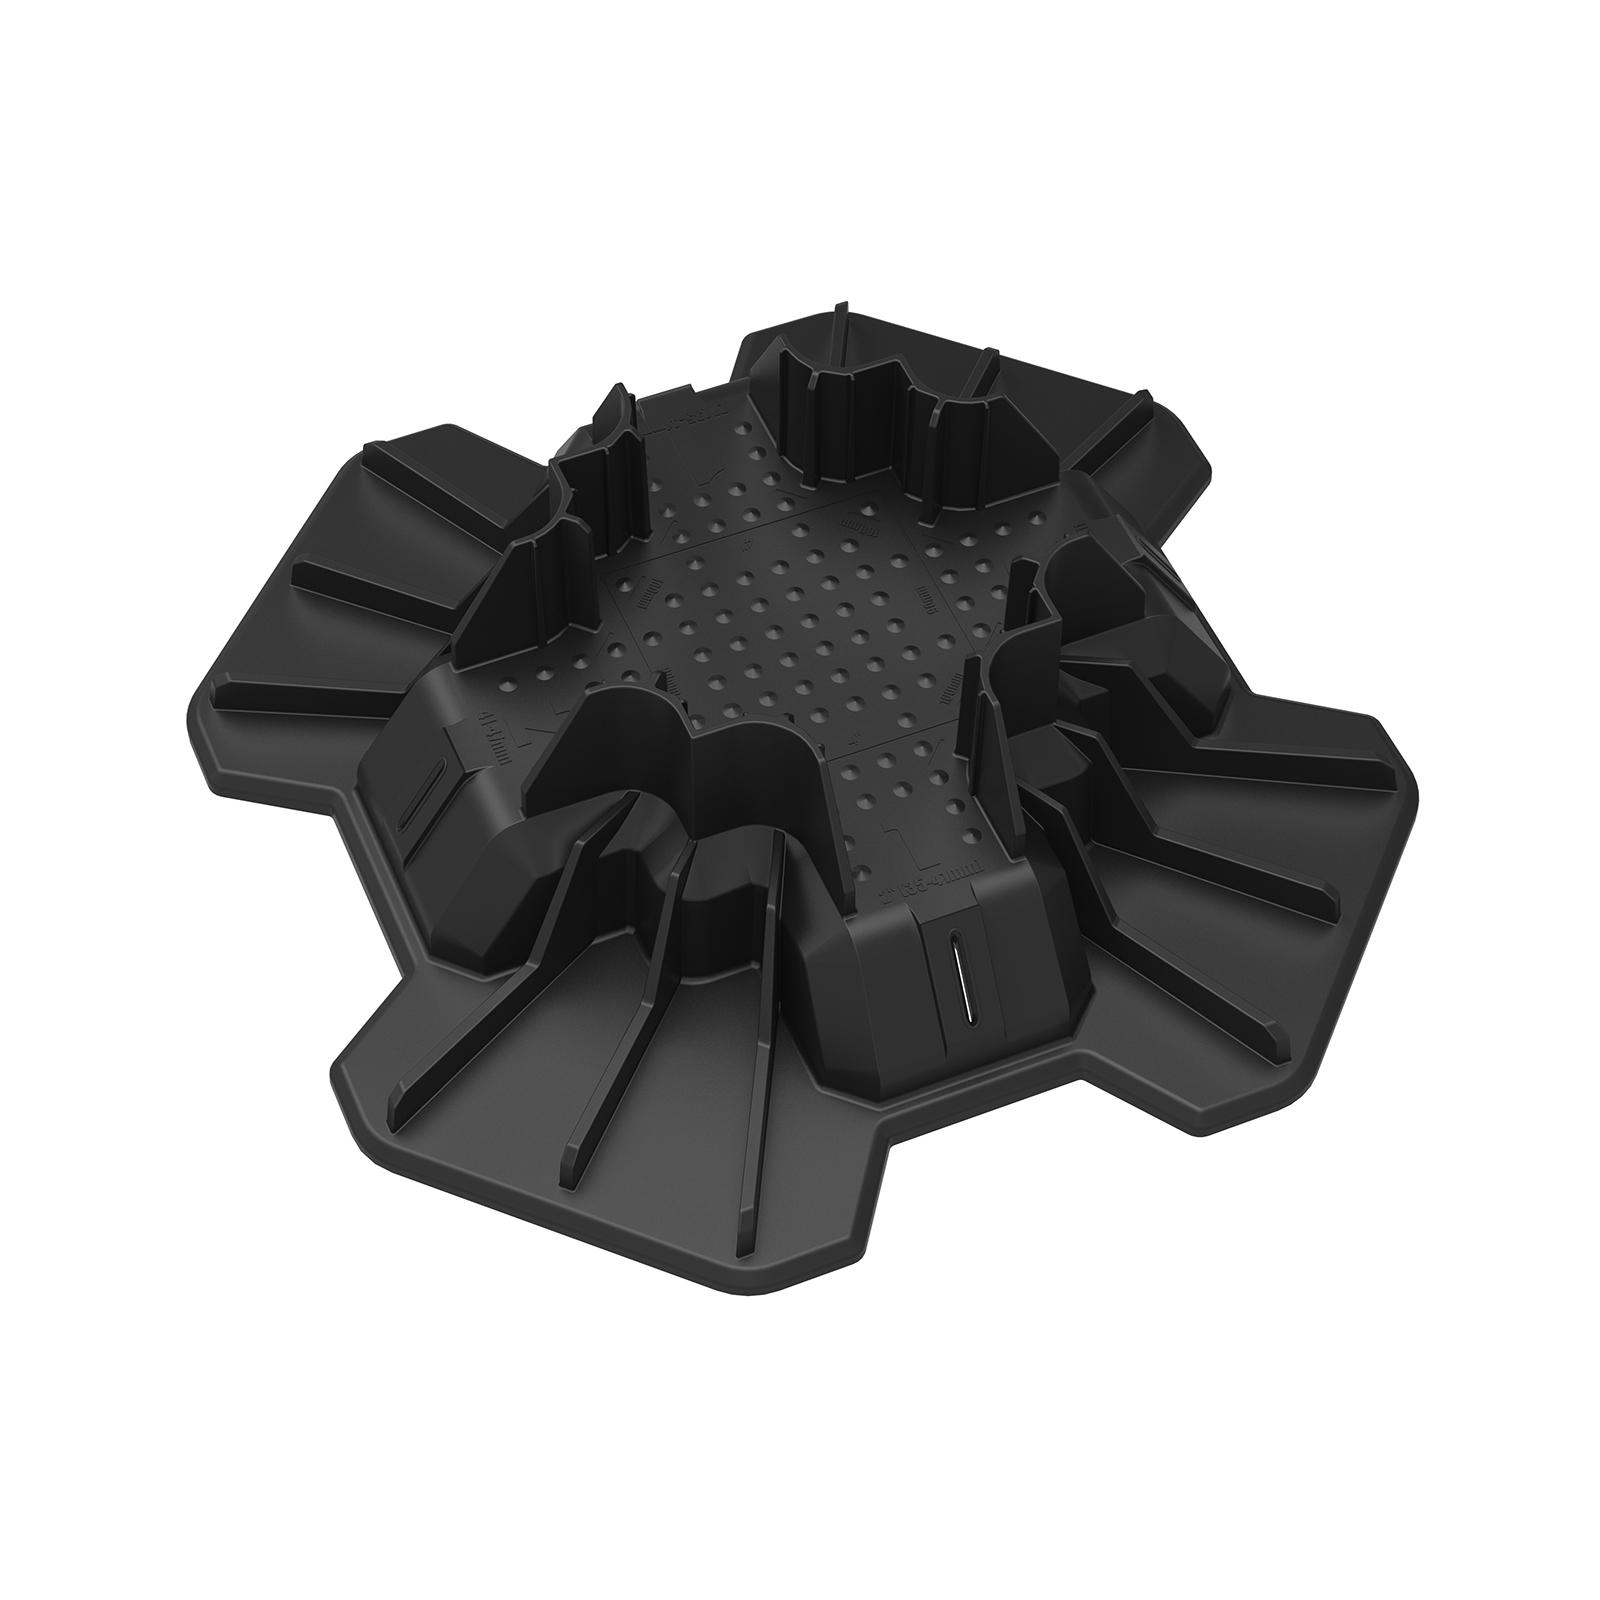 TuffBlock 300 x 300 x 90mm Instant Foundation System Deck Support